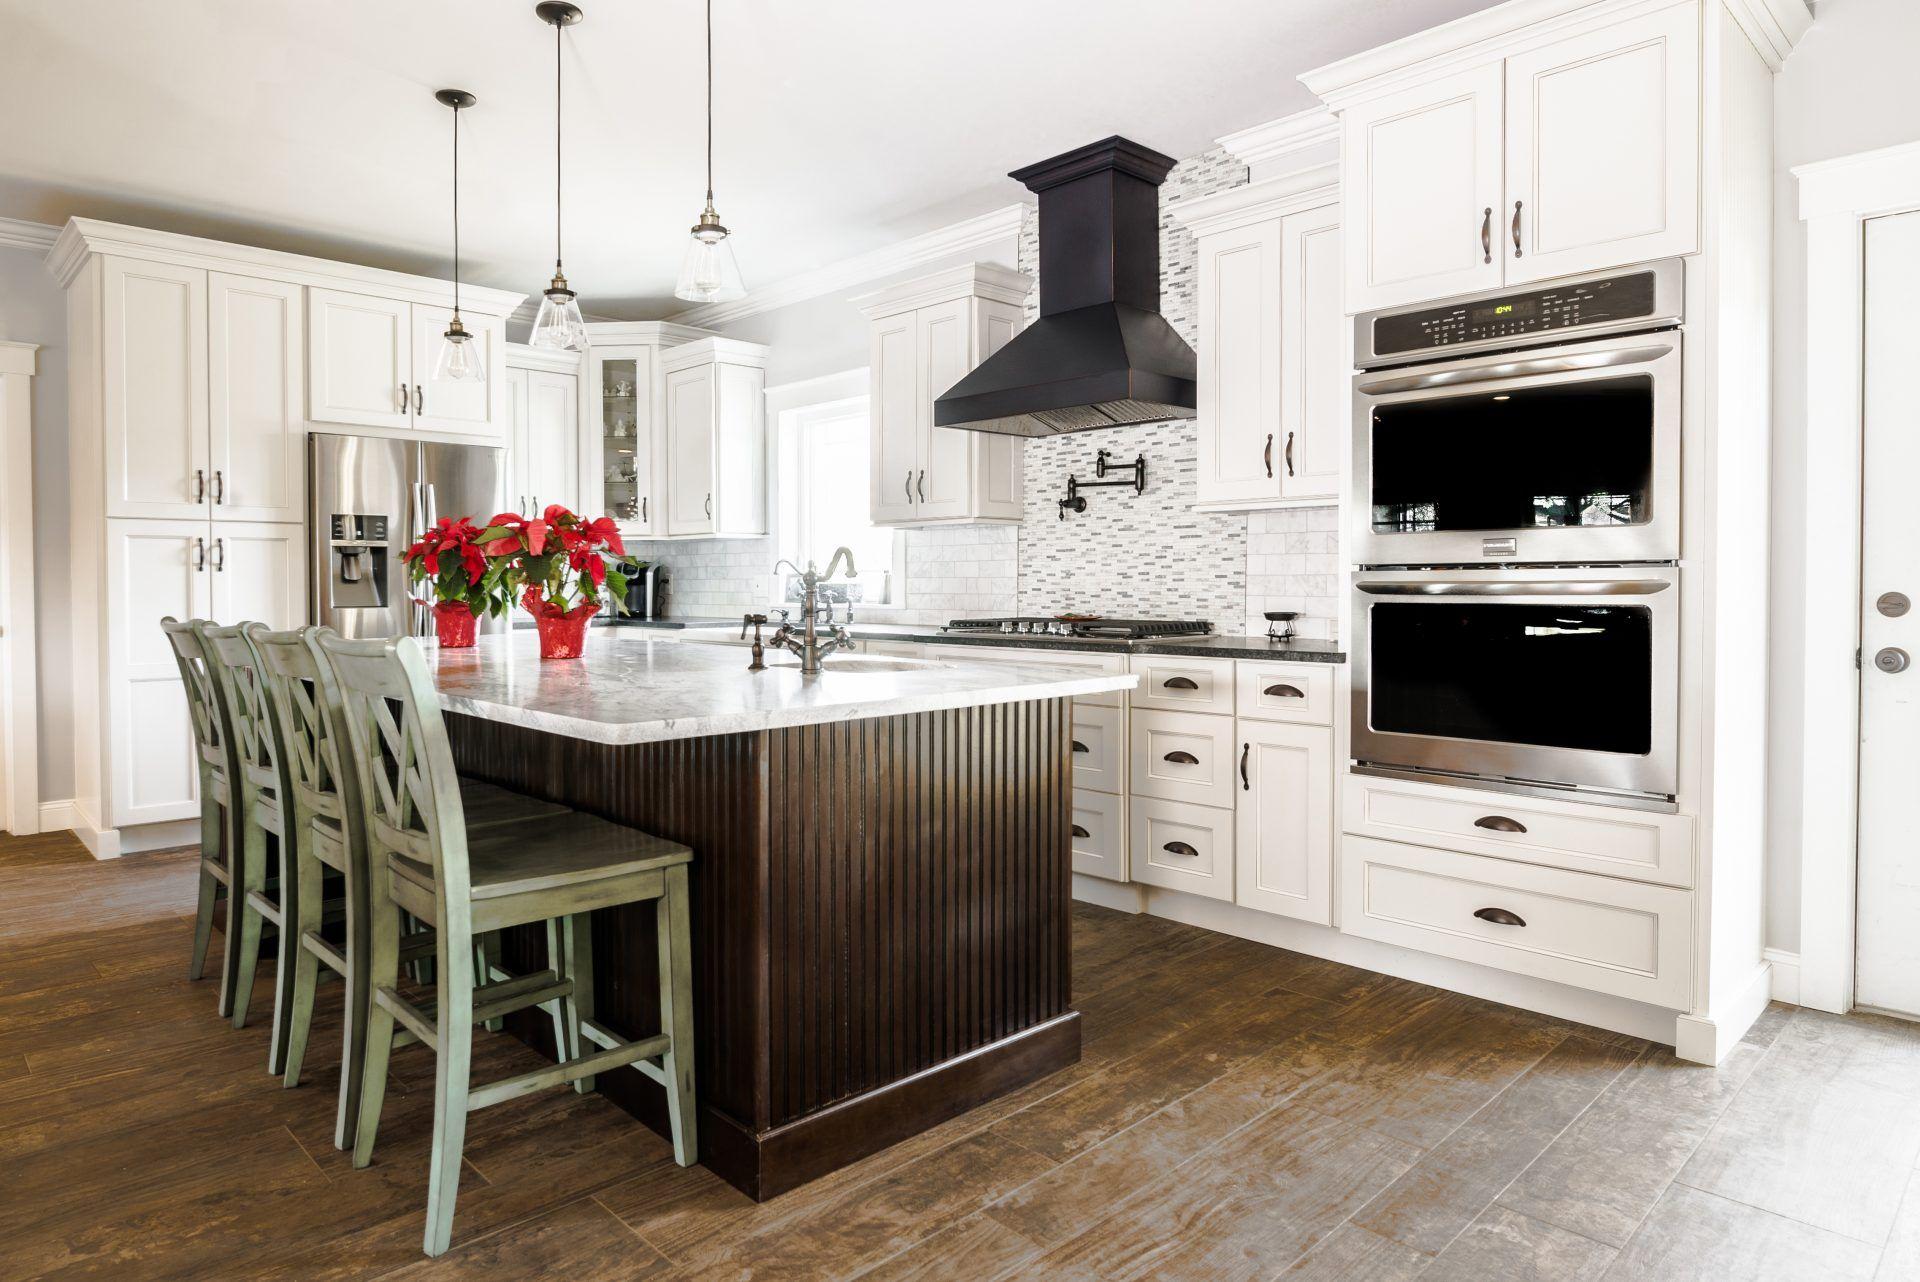 Fabuwood Allure Fusion Blanc Wholesale Kitchen Cabinets Kitchen Cabinets Shop Kitchen Cabinets